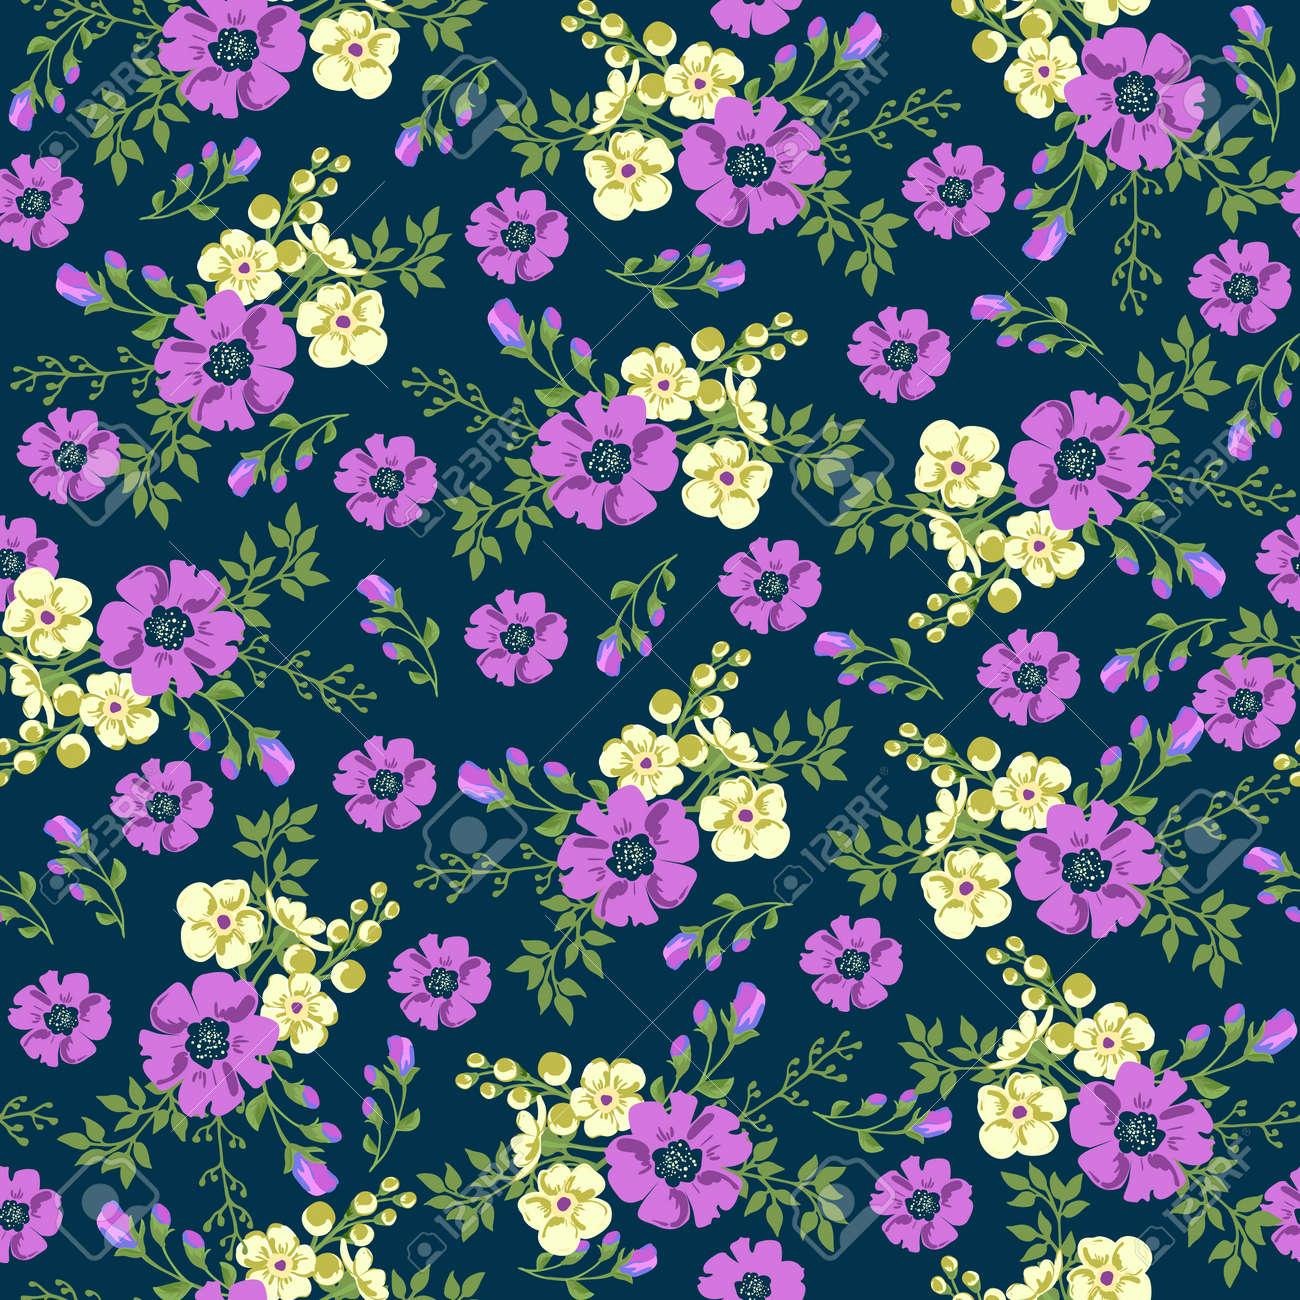 Seamless pattern in small flower. Romantic flower print. Ditsy floral. Floral seamless pattern. Vector Illustration - 57191837